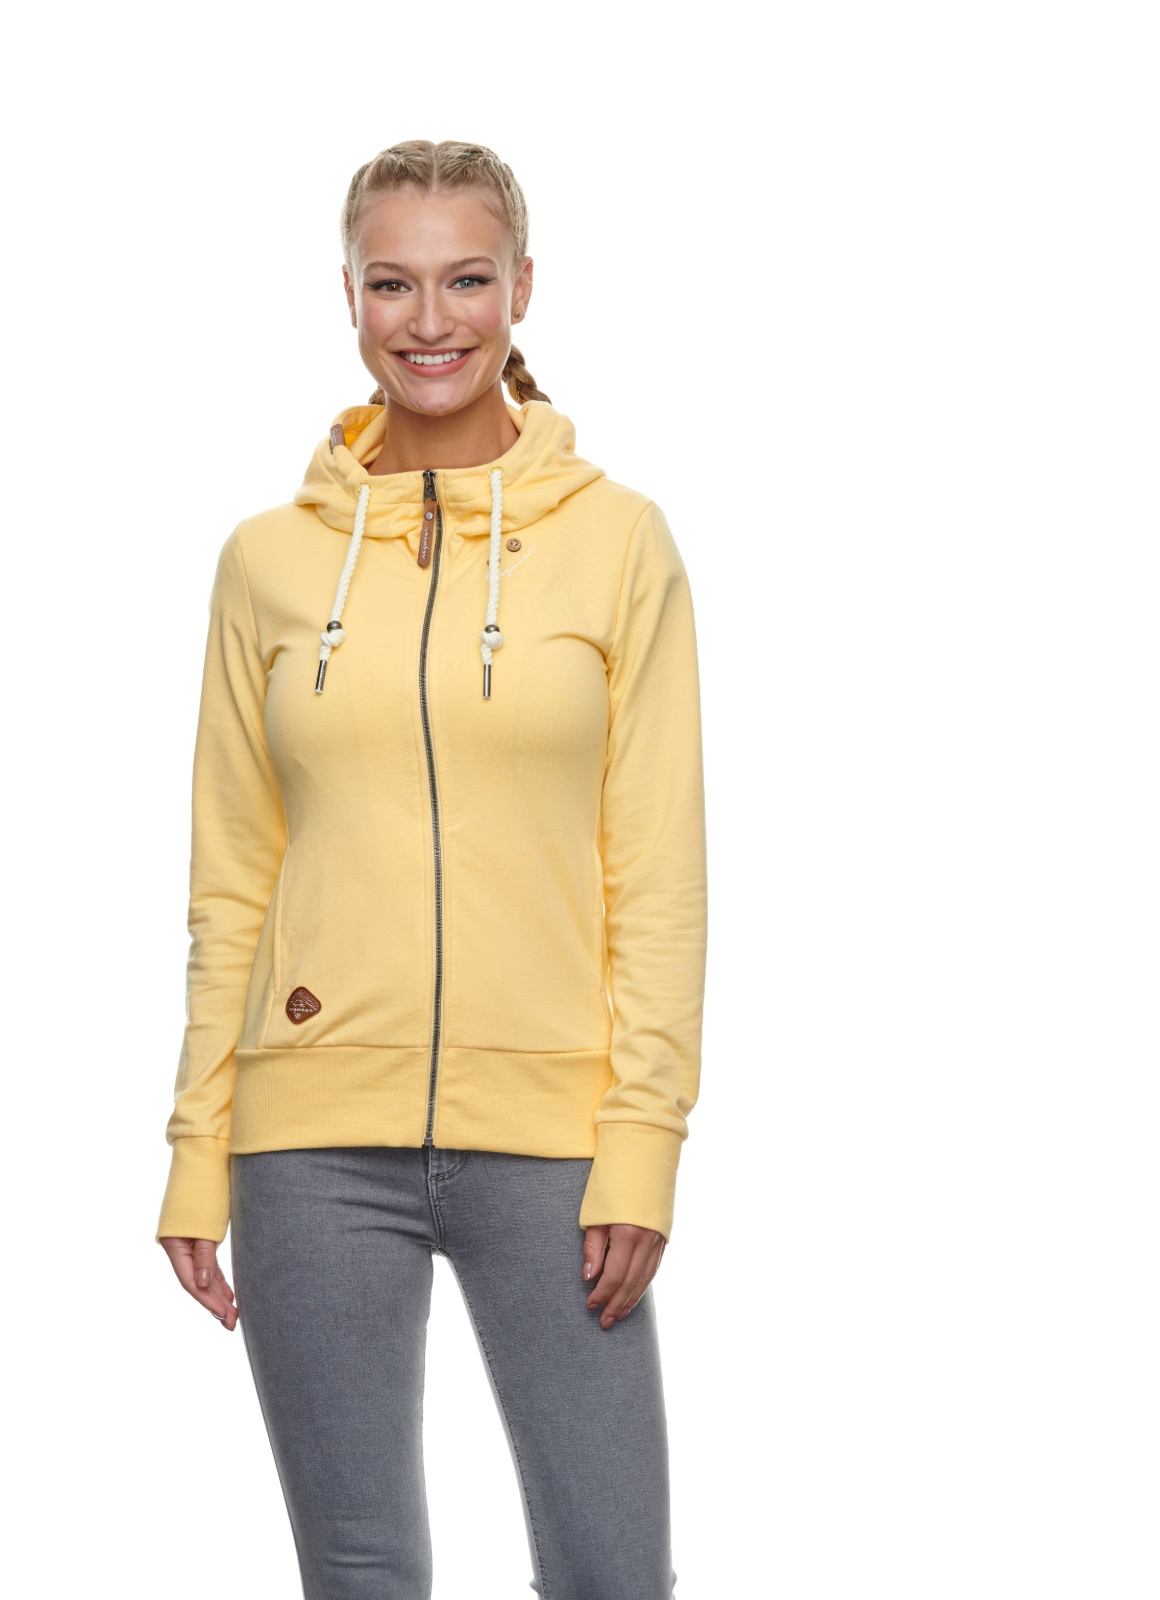 Ragwear Damen Sweat Jacke gelb unifarben Paya 2111 30038 6033 Vanilla